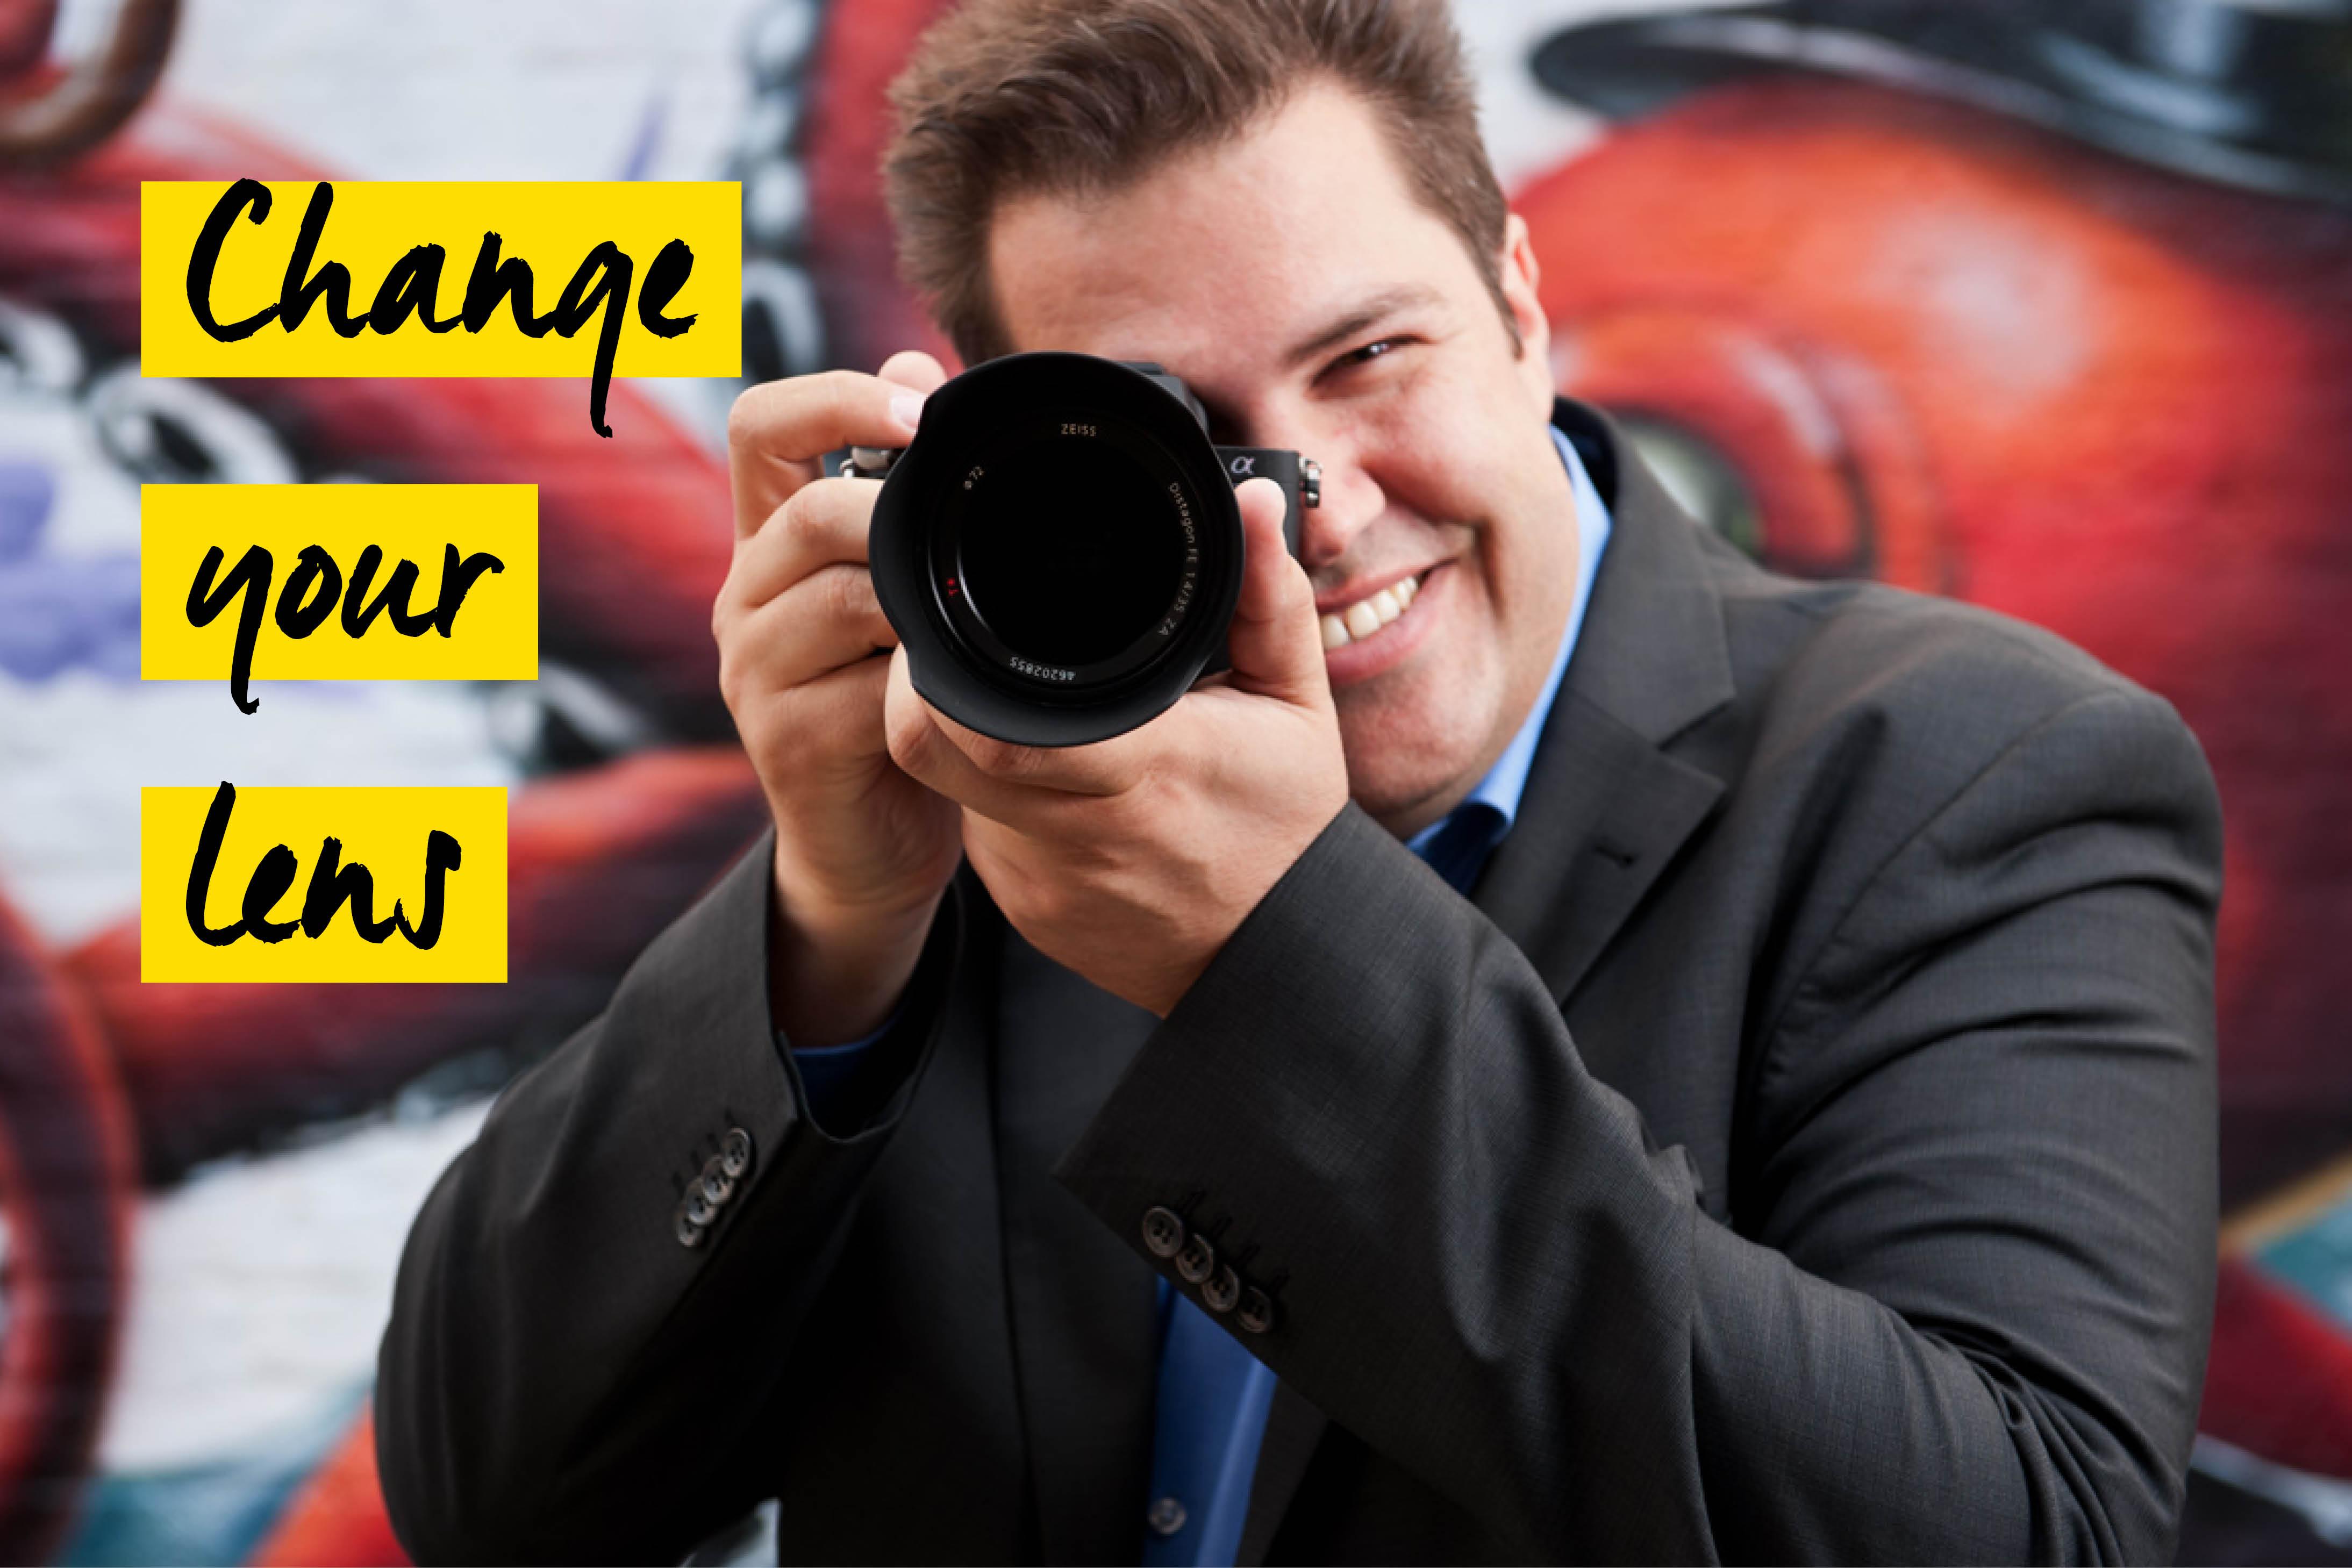 Mann mit Sony Kamera